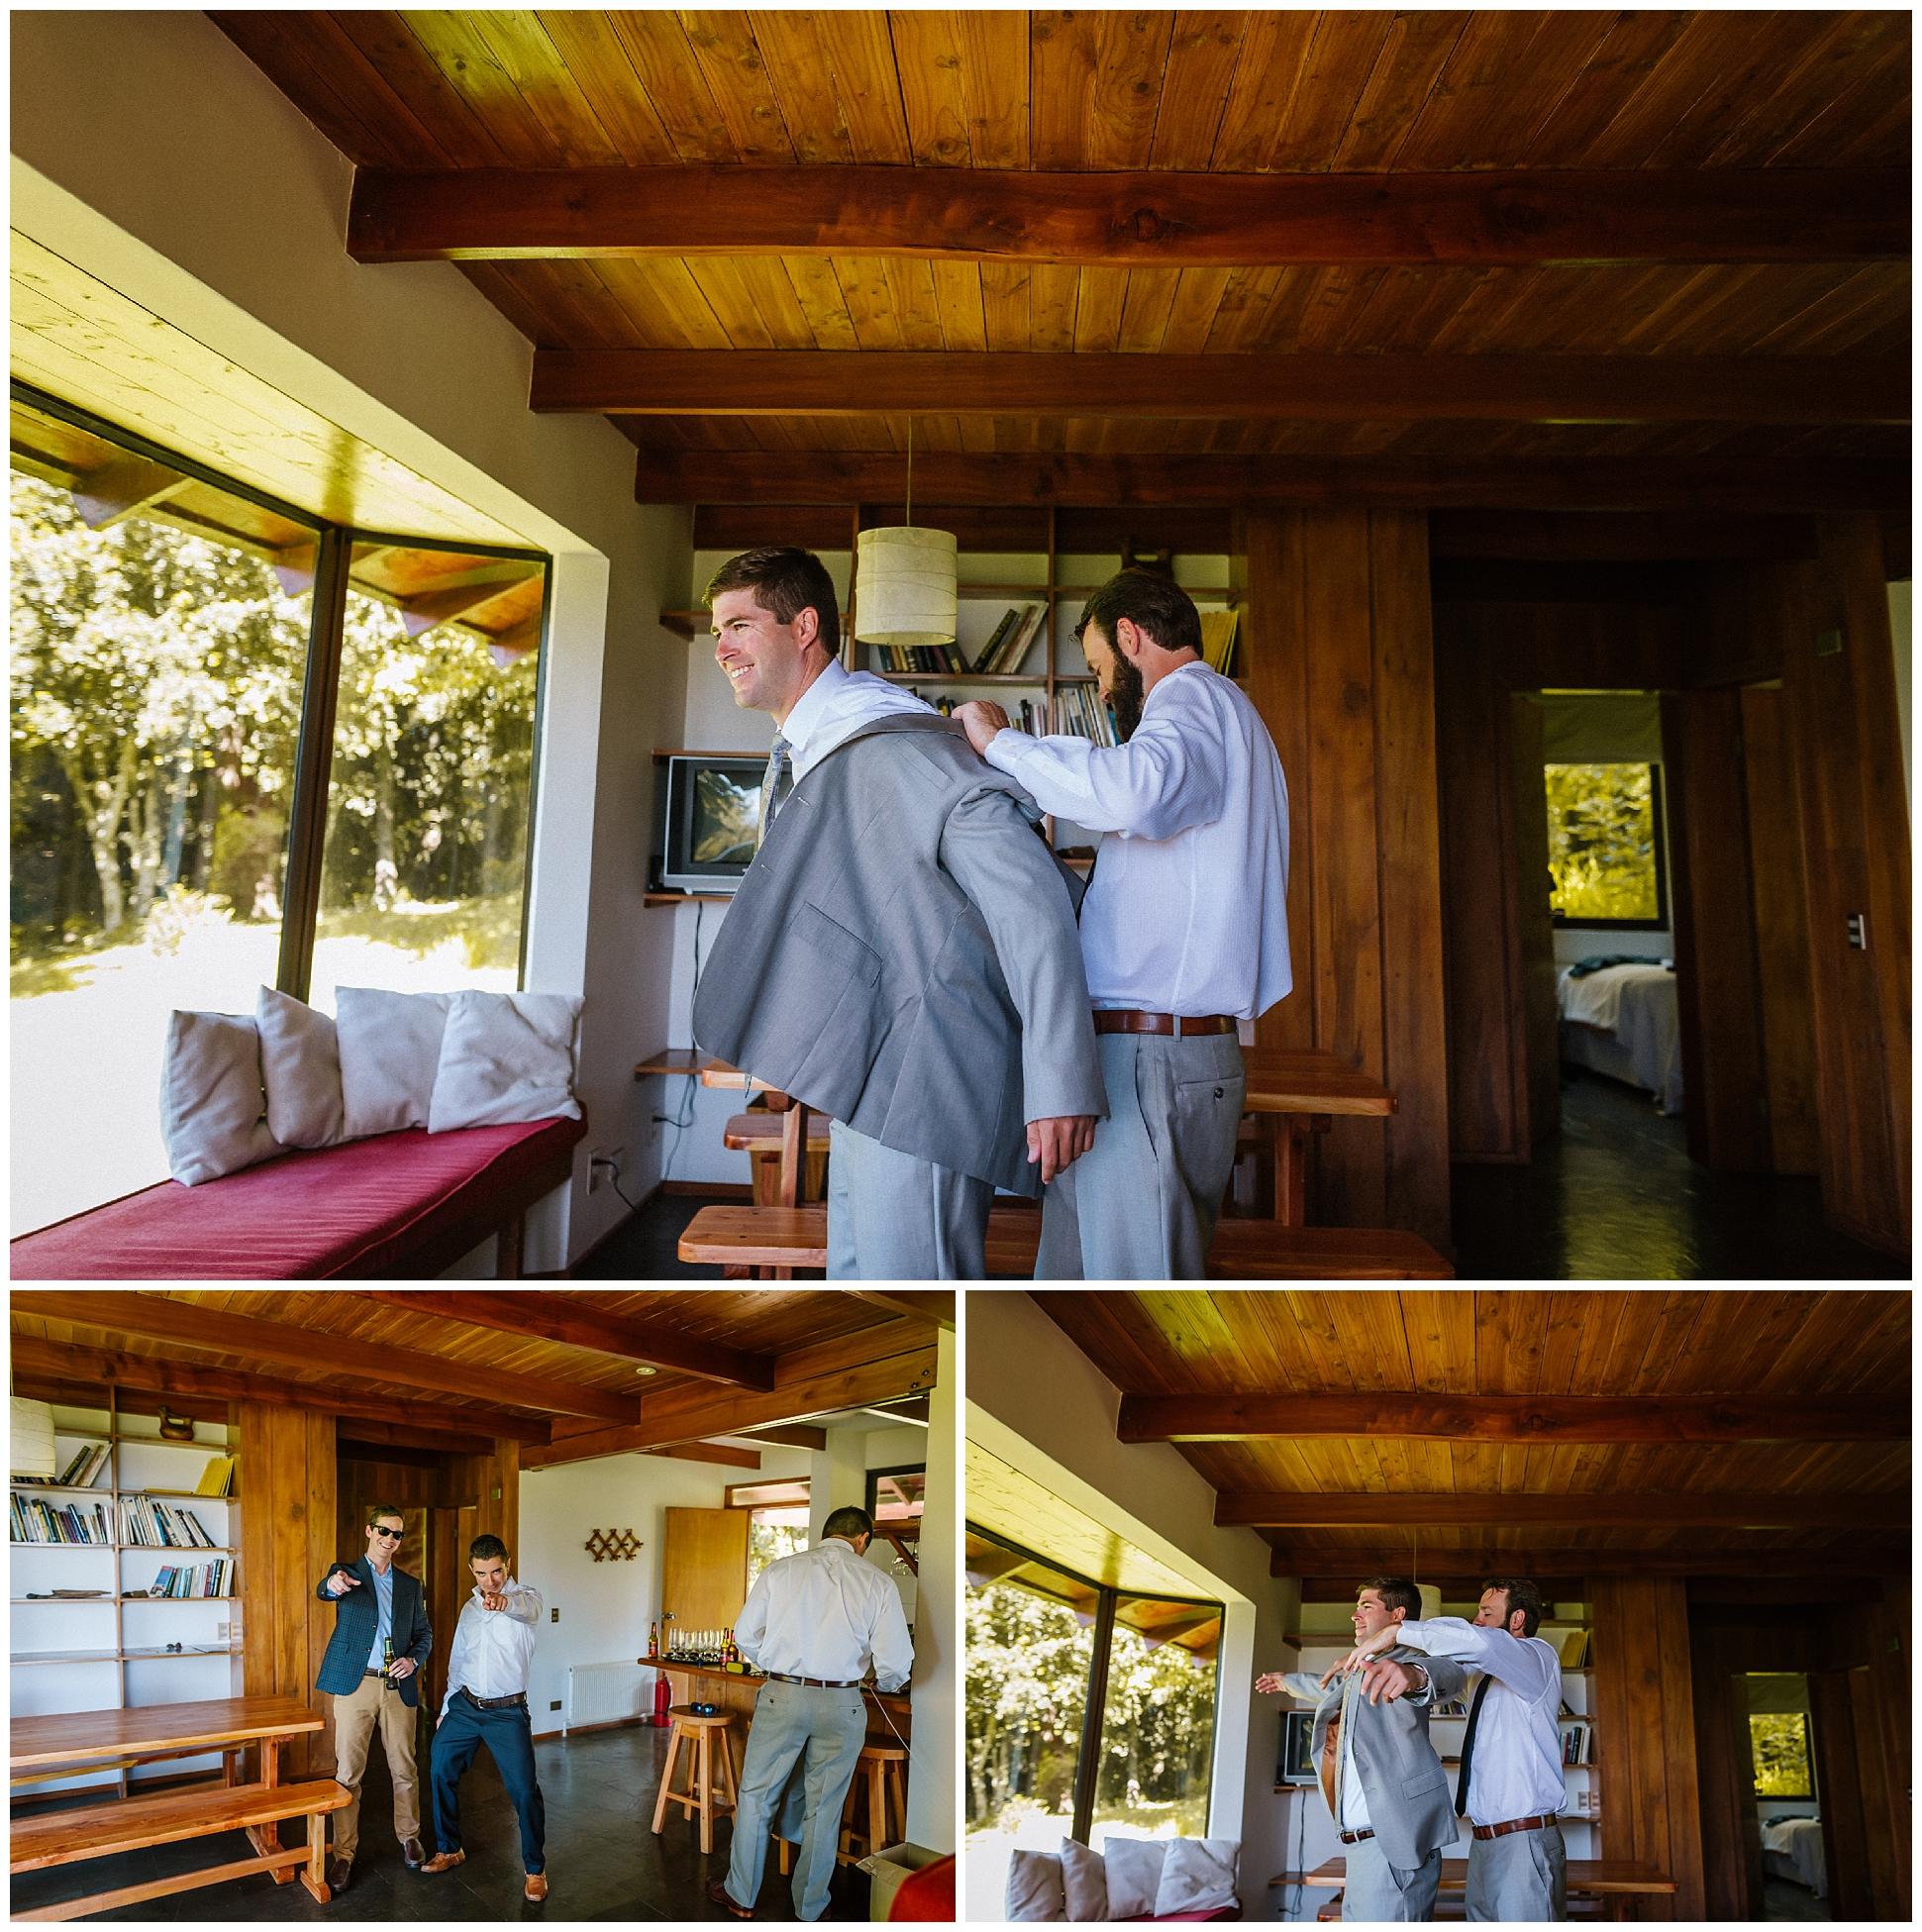 Cheilean-destination-adventure-wedding-florida-patagonia-pucon-santa-cruz-vsco_0075.jpg